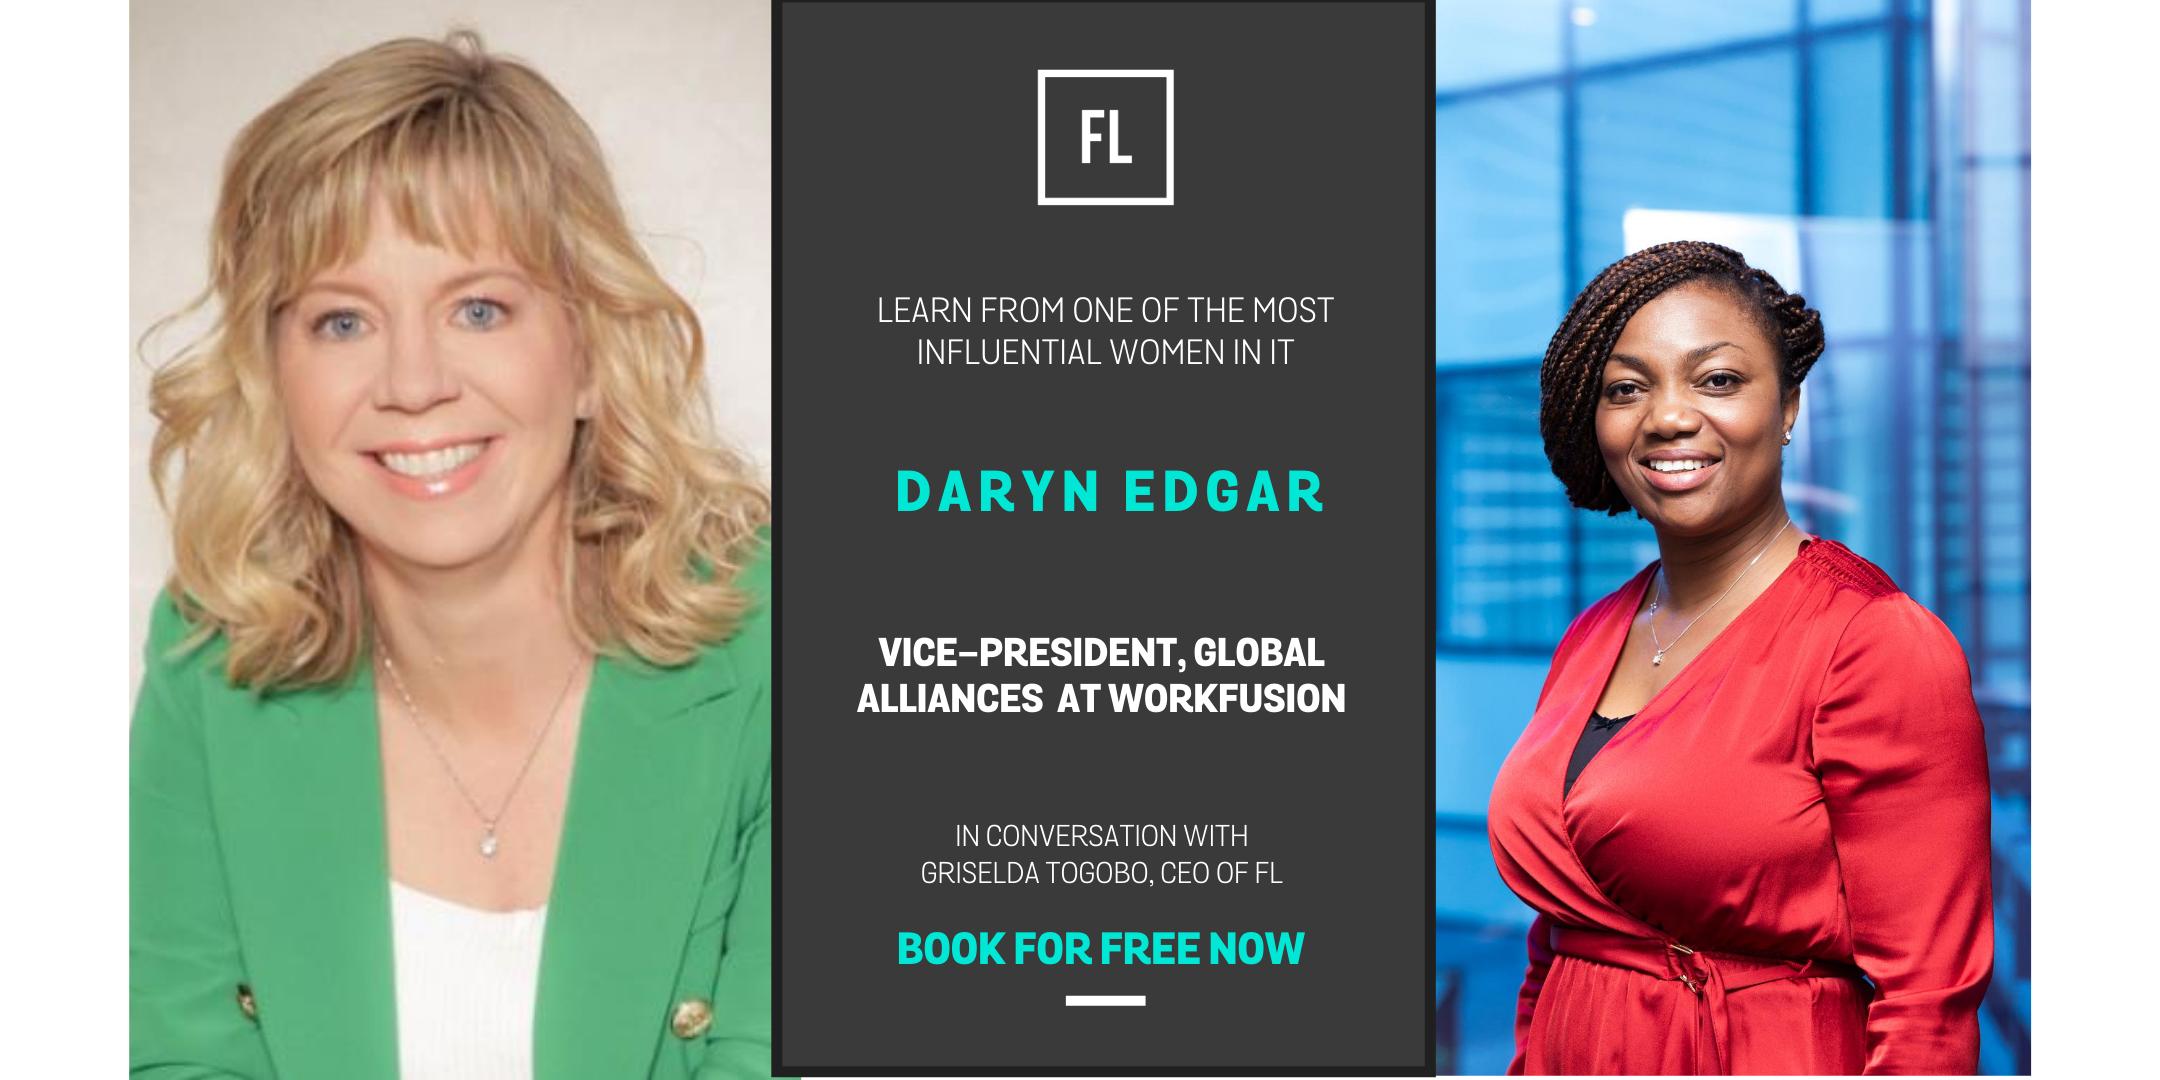 In Conversation With Daryn Edgar, Digital Business Leader